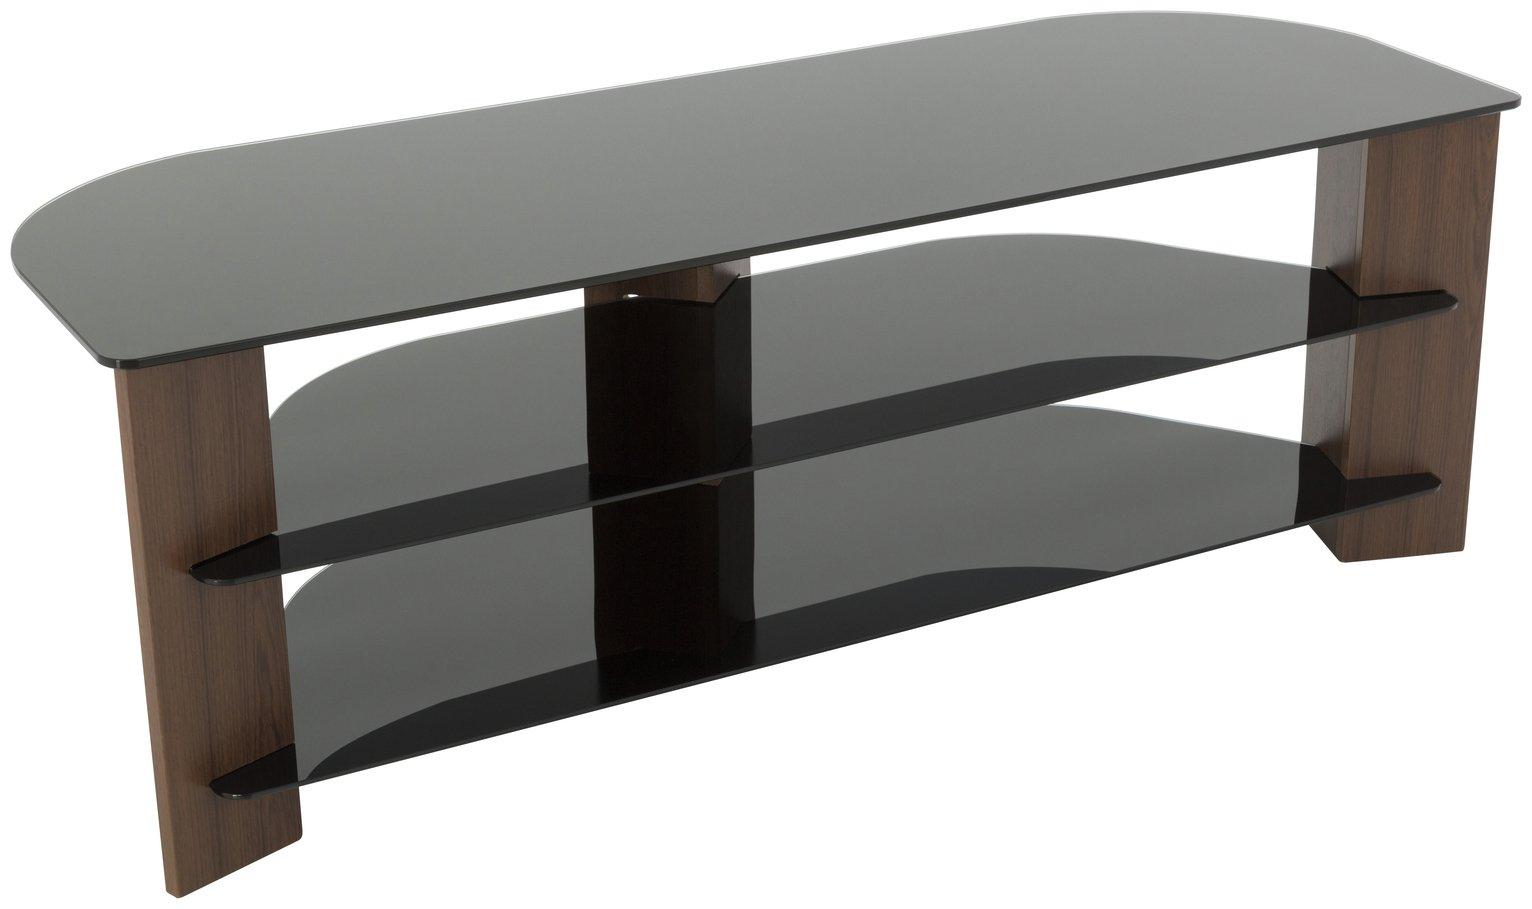 AVF AVF Up To 65 Inch TV Stand - Walnut and Black.